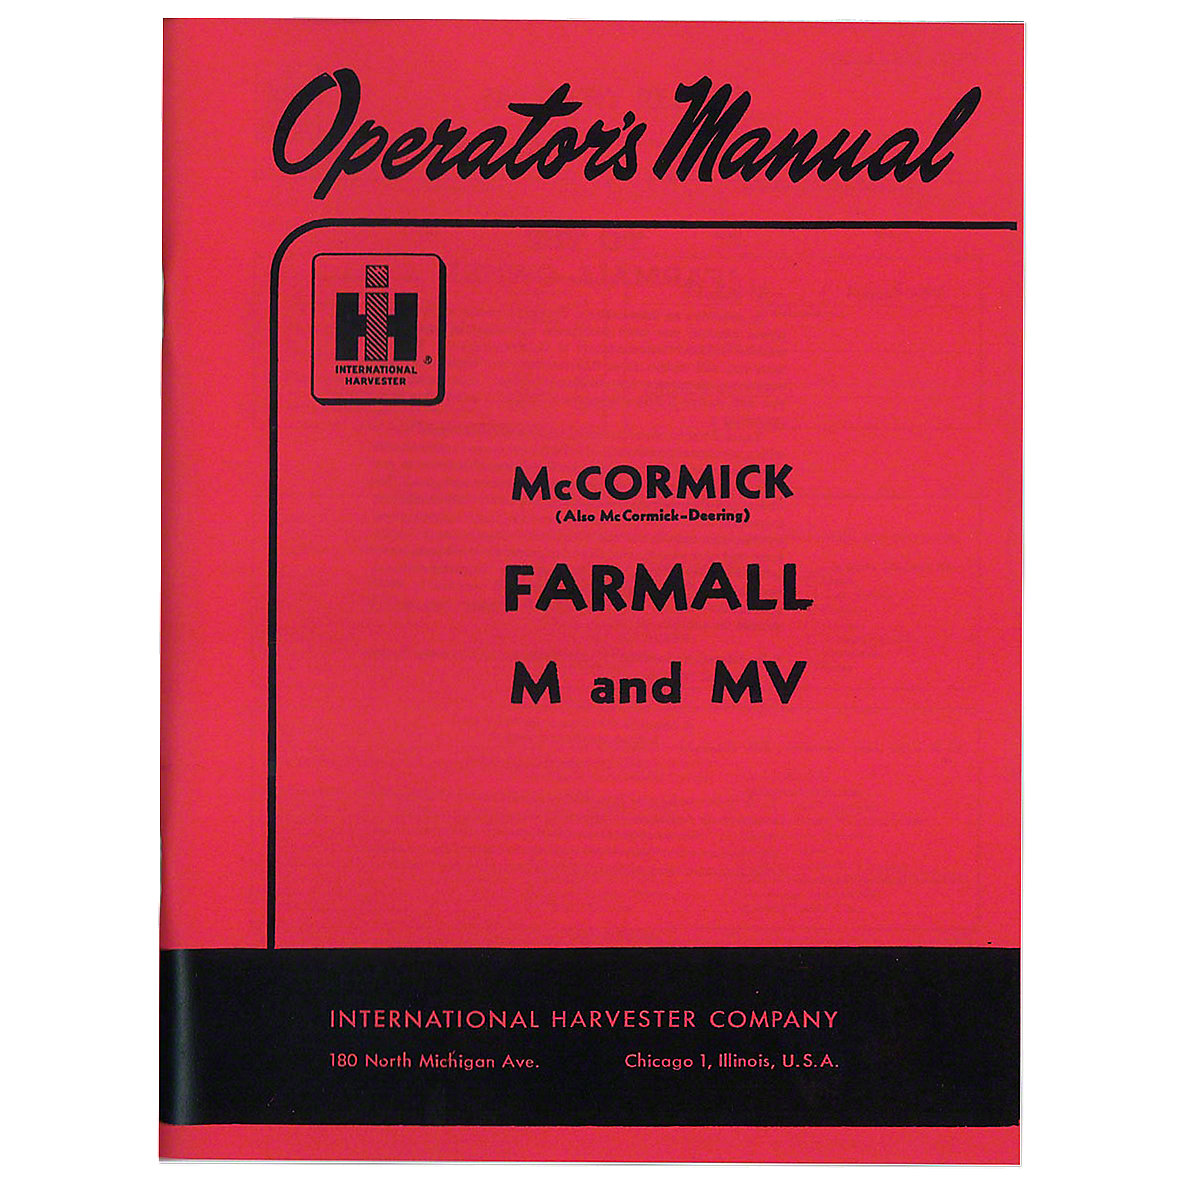 Operators Manual: Farmall M 1939-1952